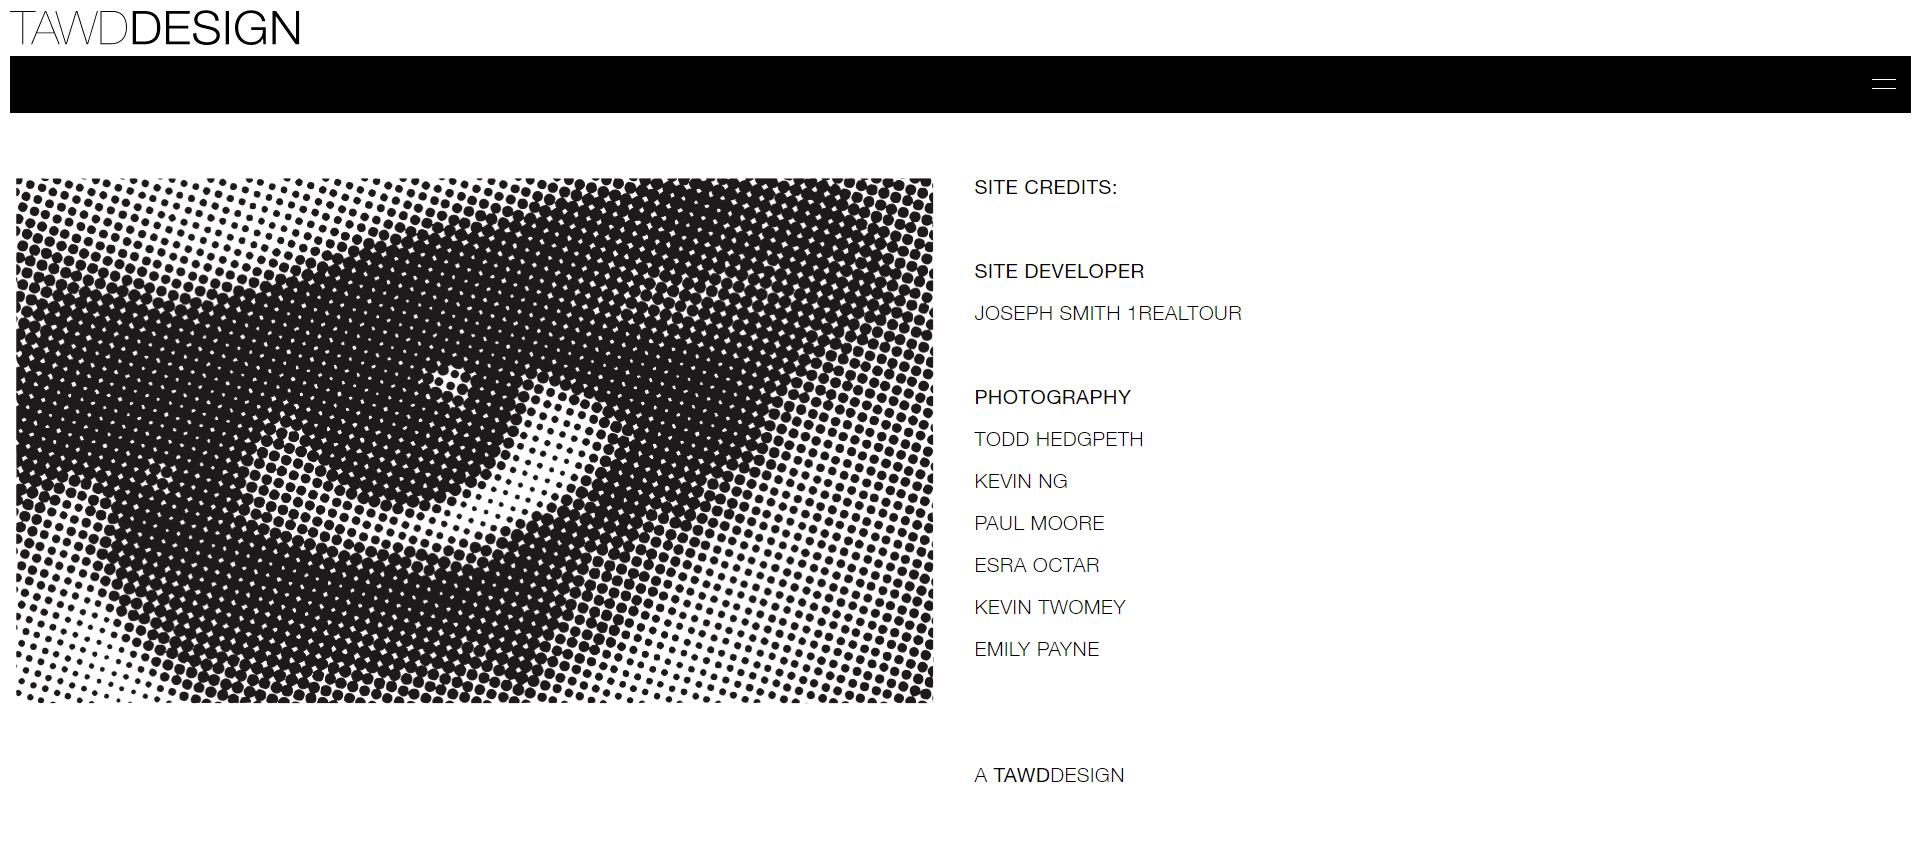 TAWDDESIGN.com 7